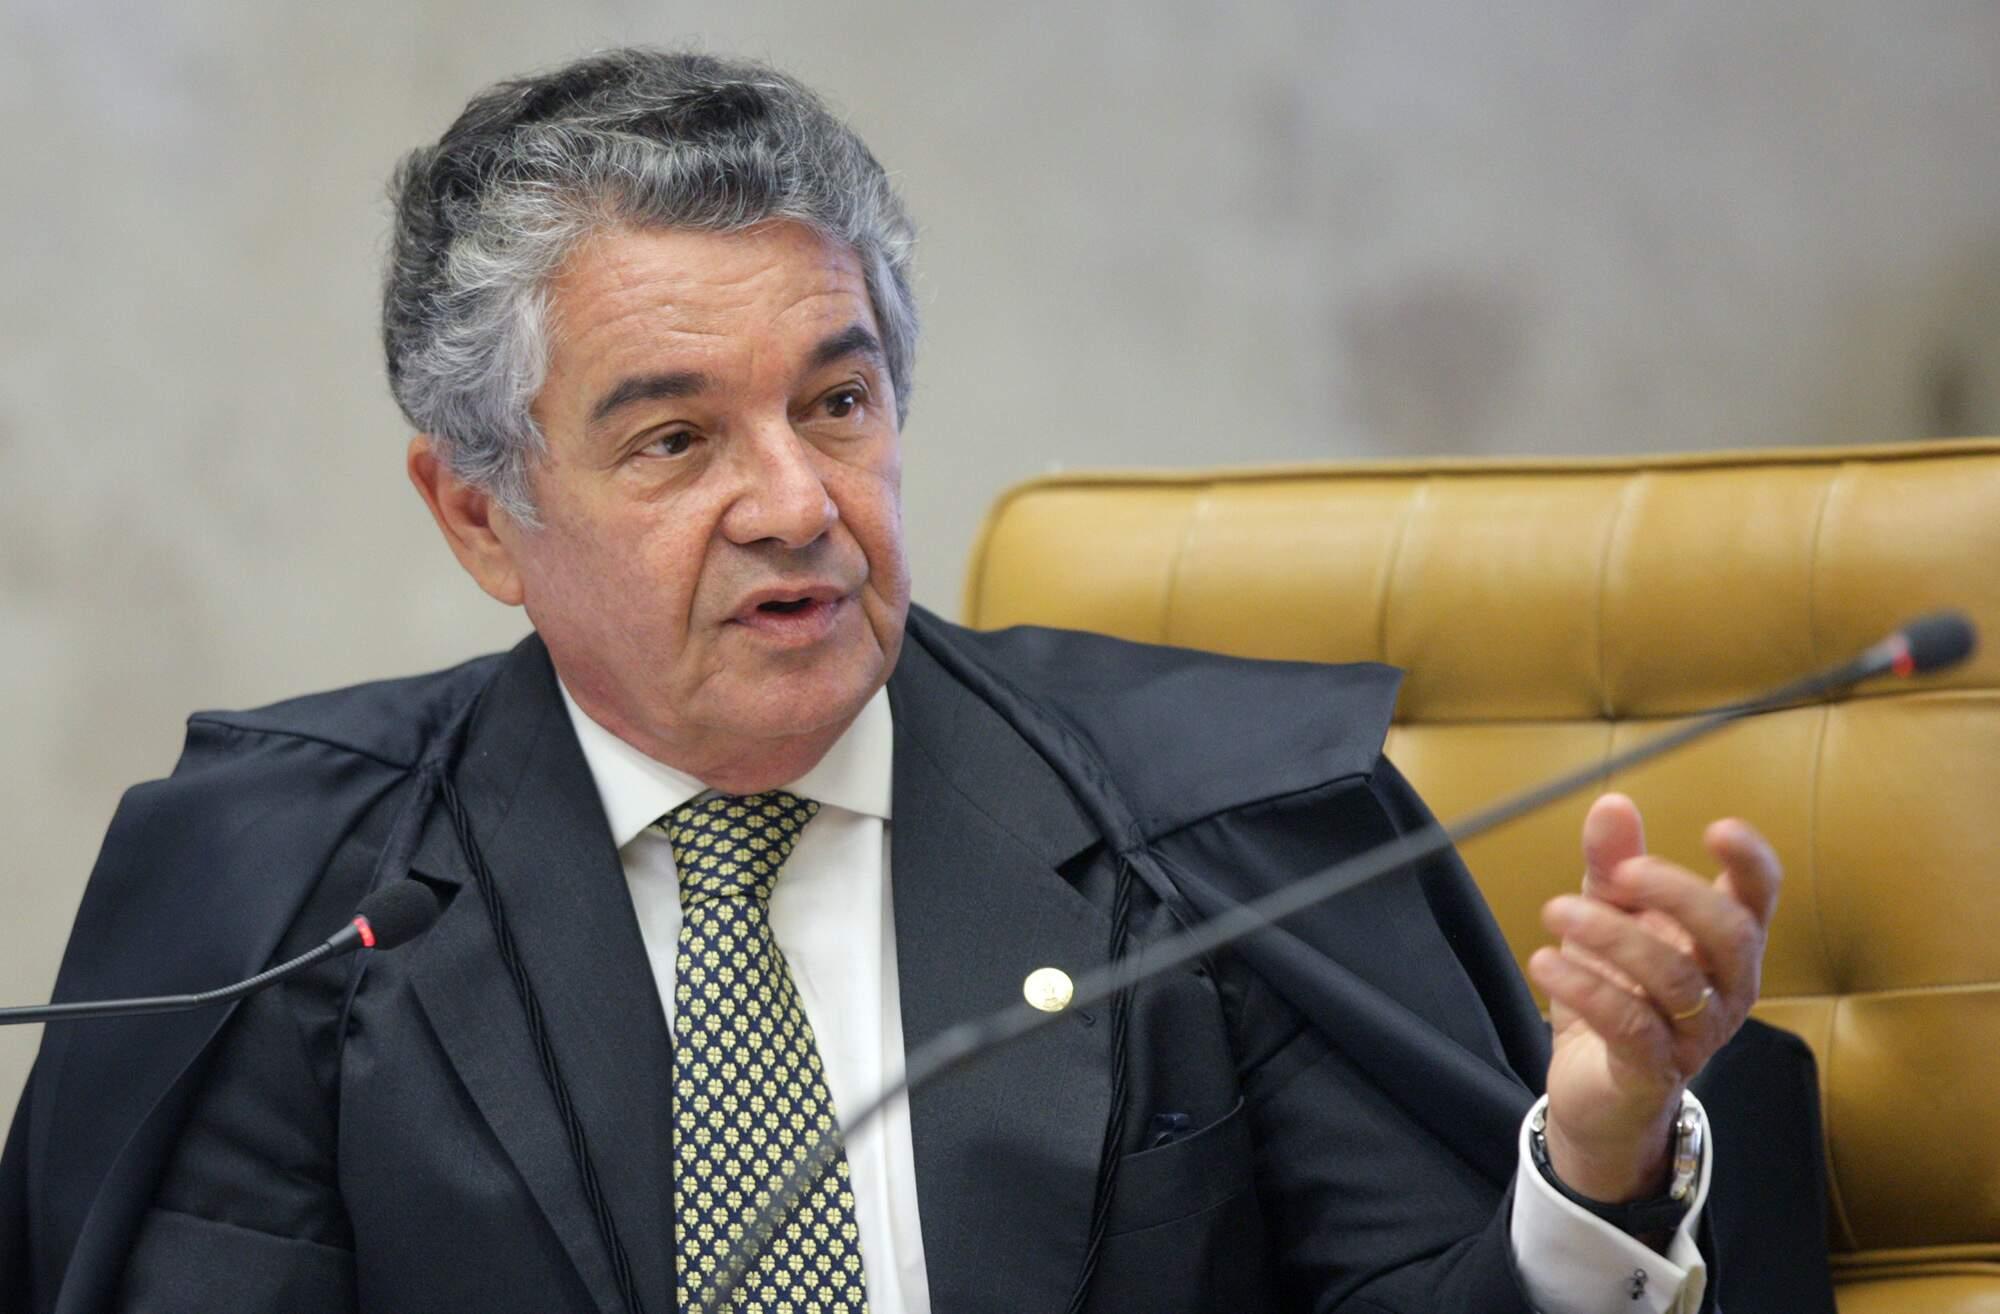 Marco Aurélio antecipa voto autorizando depoimento de Bolsonaro por escrito